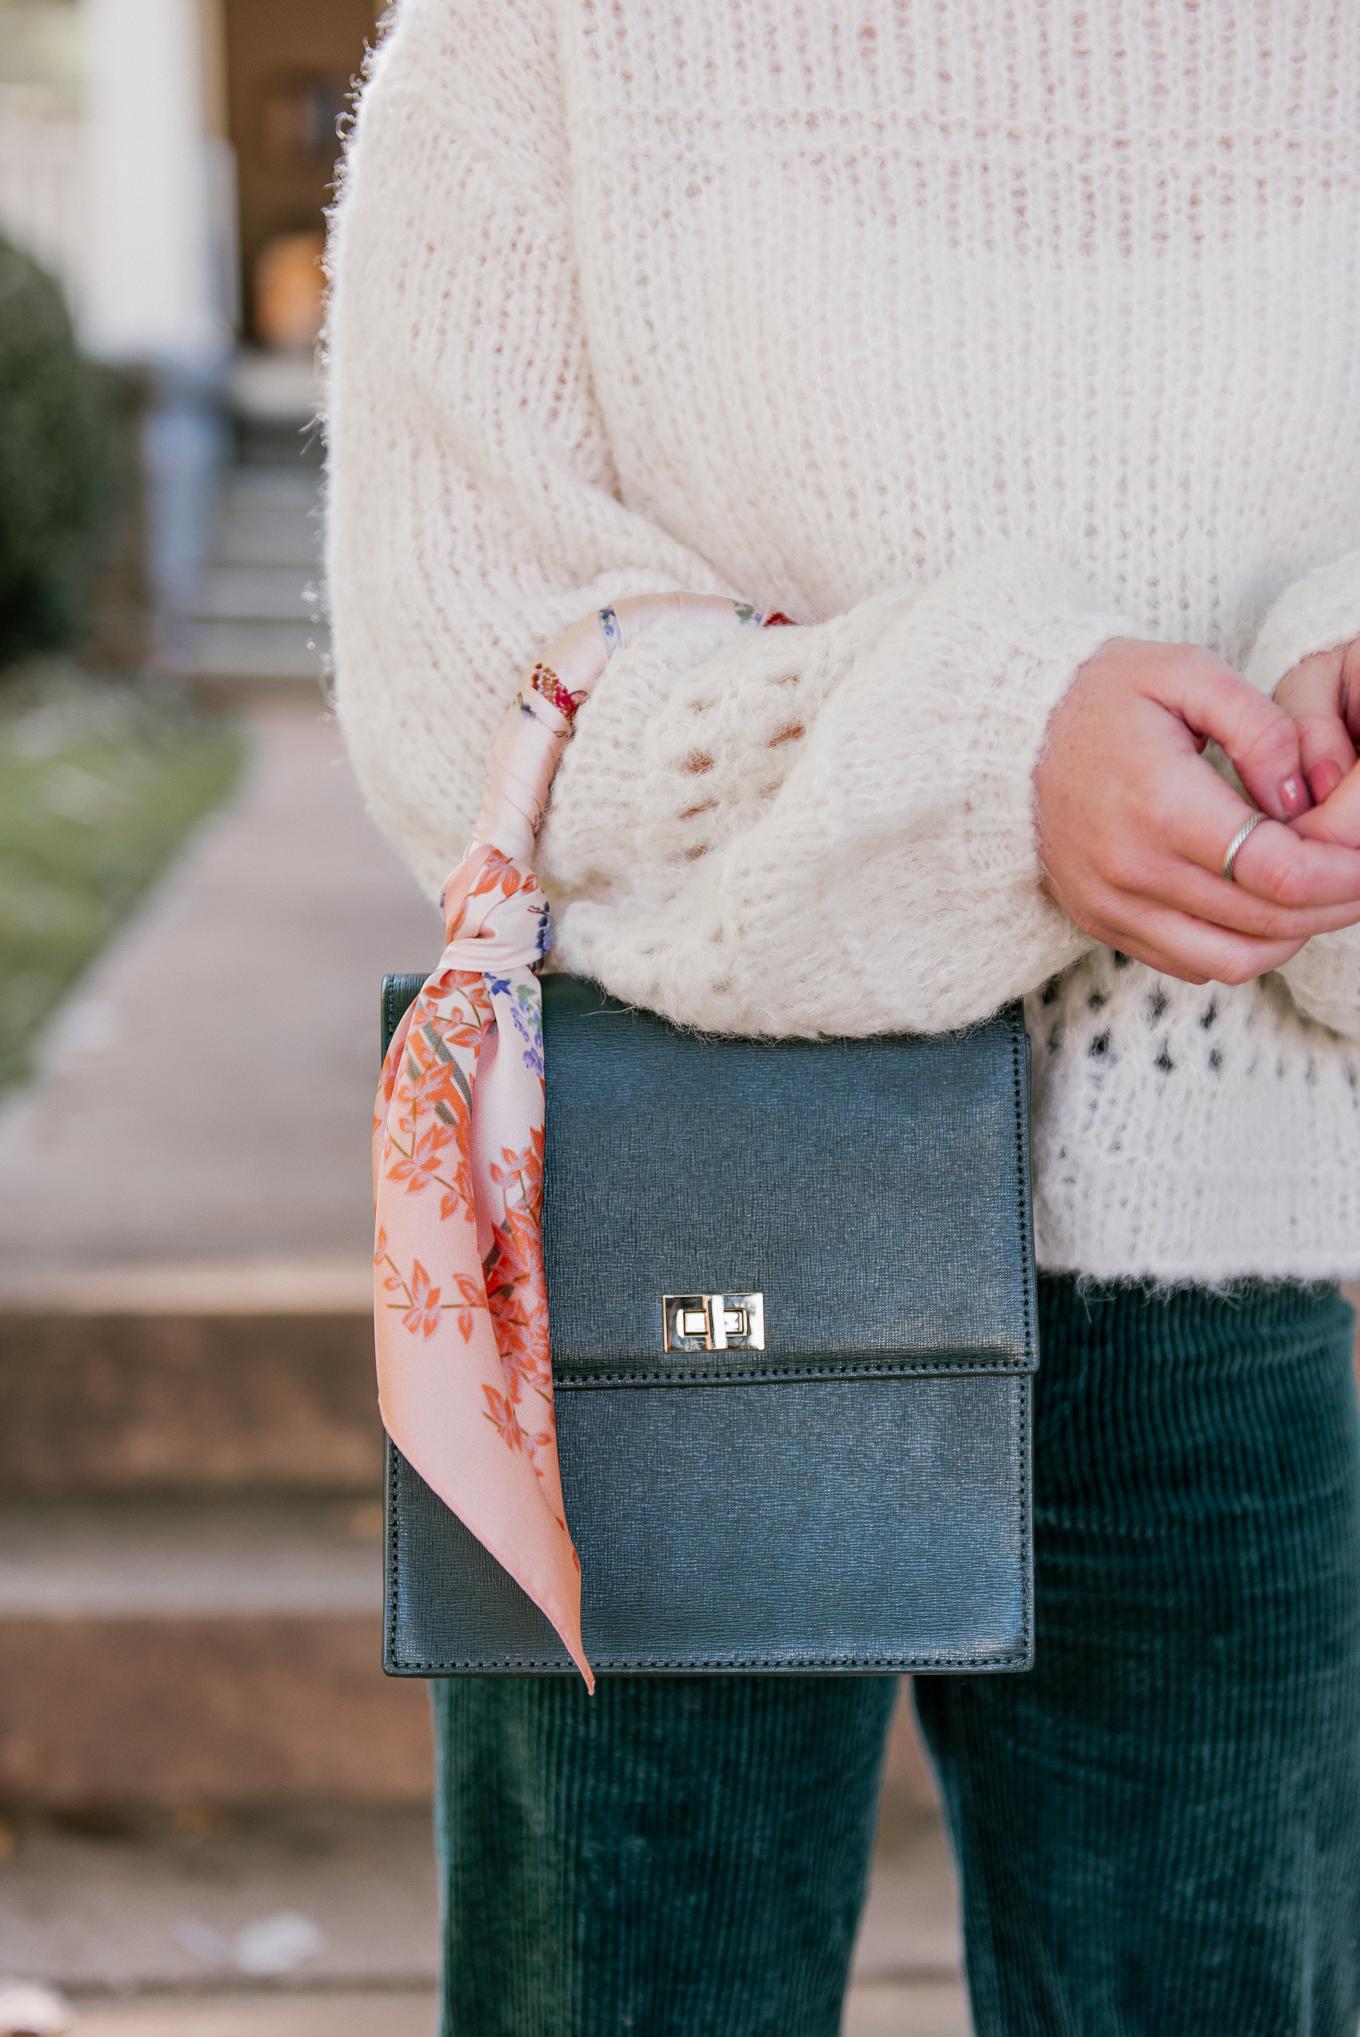 Ladylike Handbags, Top Handle Handbag | How to Style a Scarf on your Handbag | Louella Reese